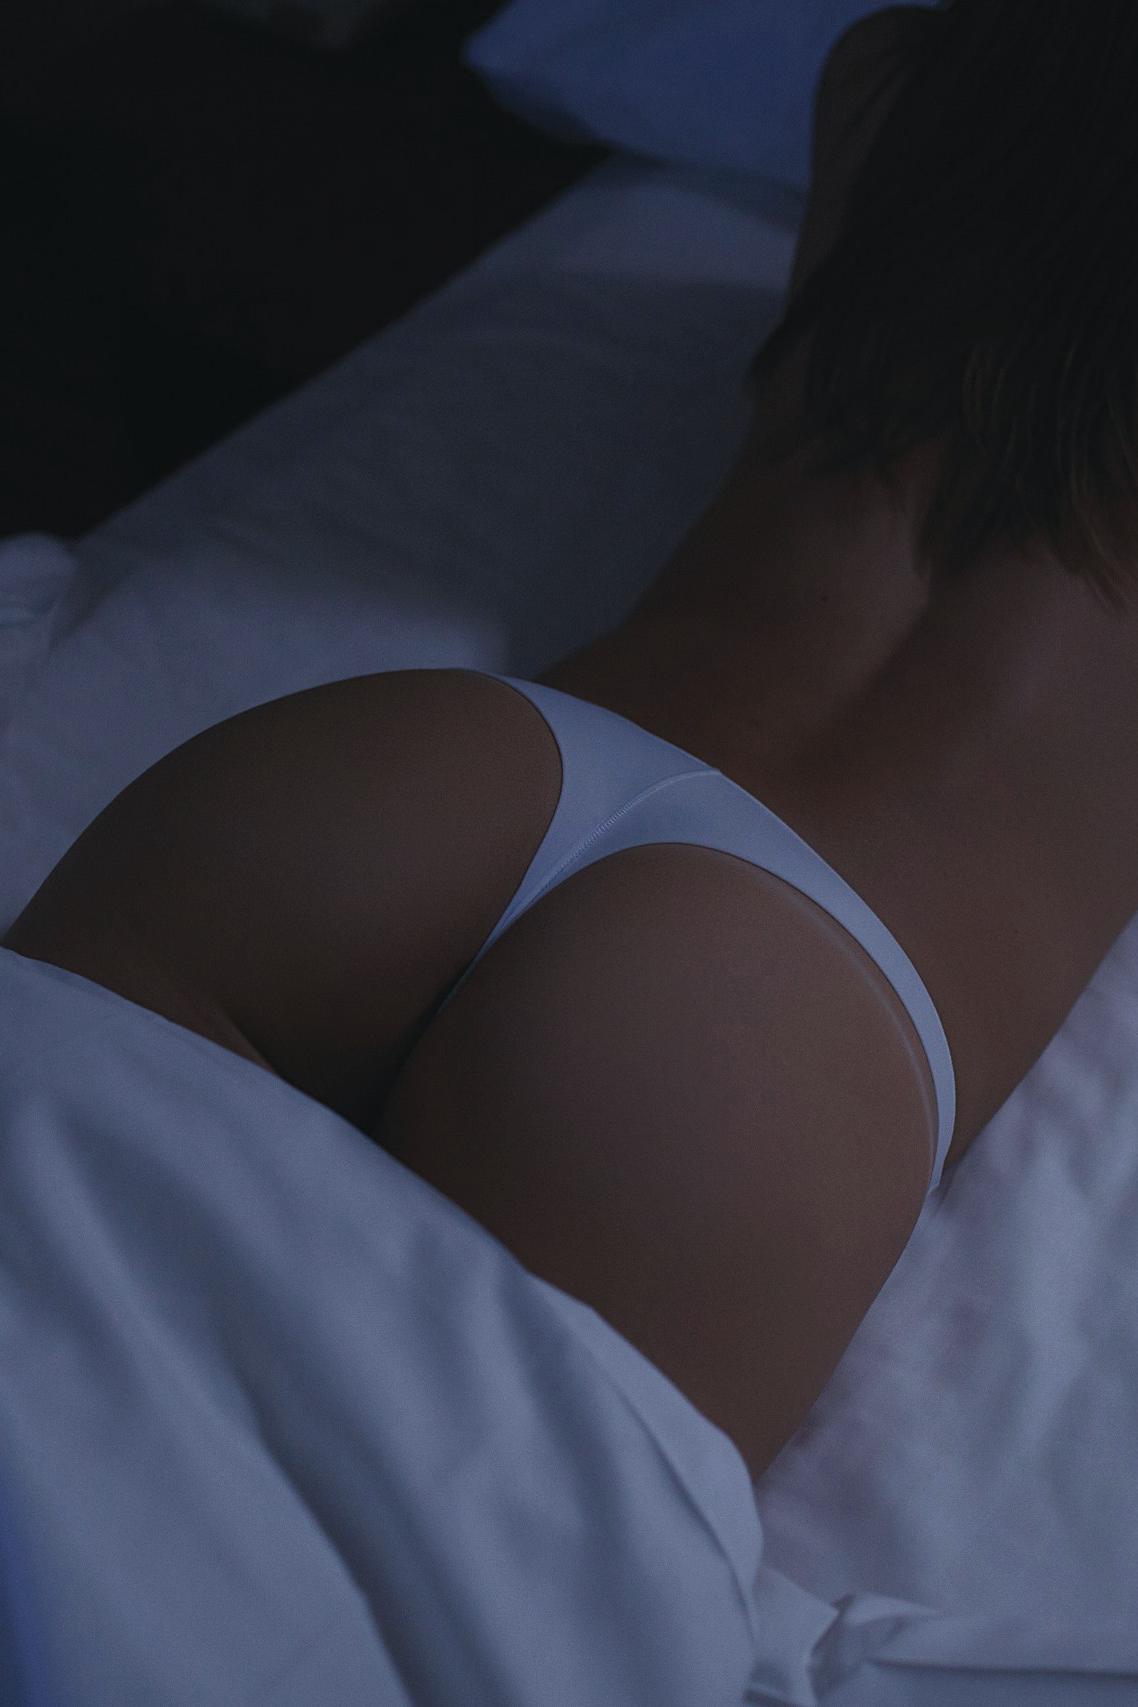 Panties Wallpapers Gif